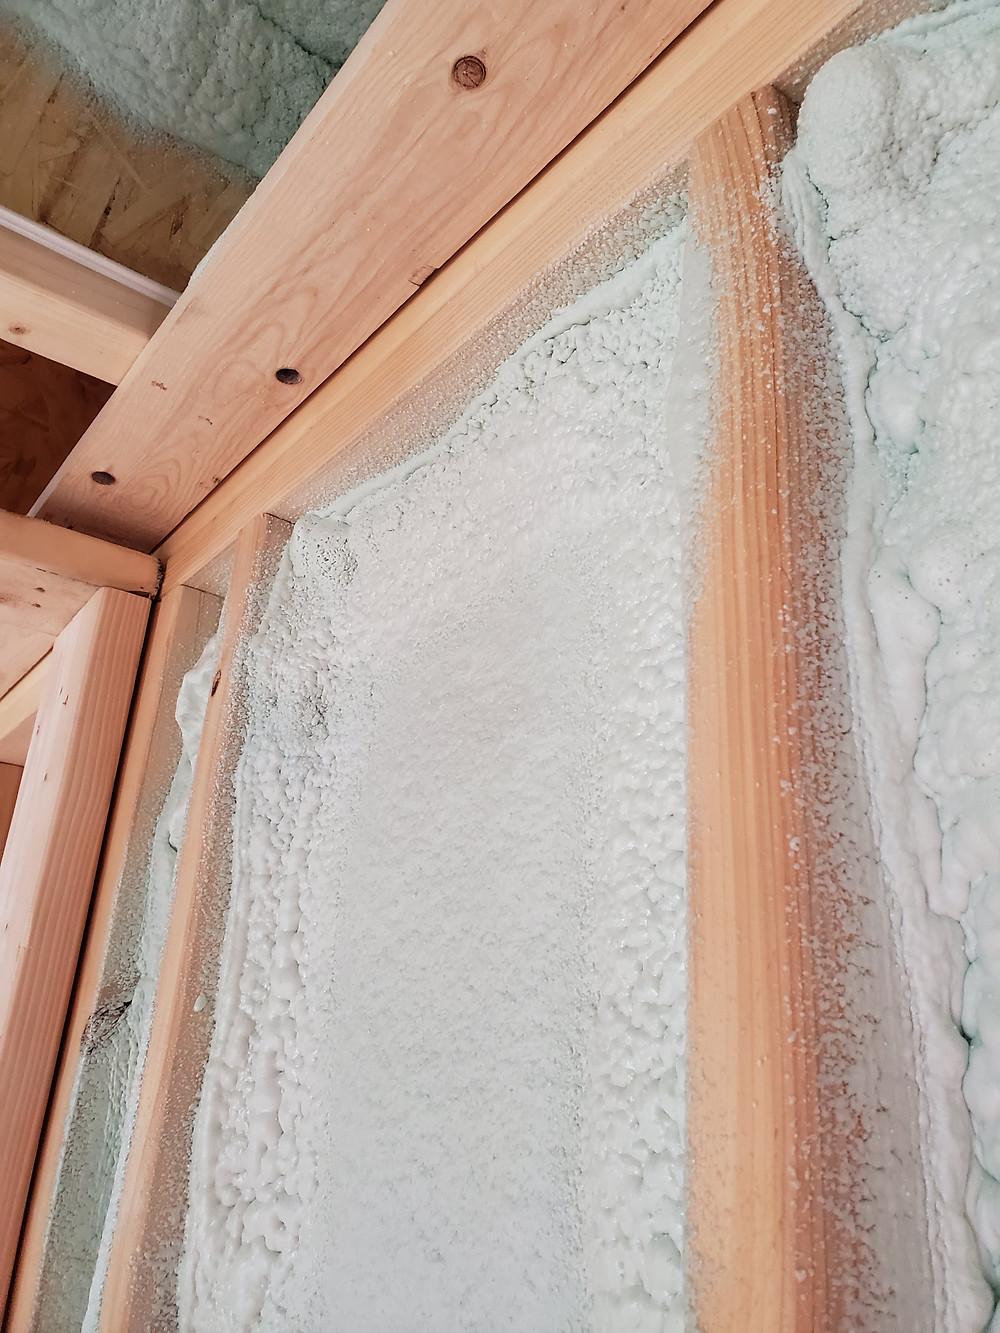 Demilec Heatlok Soya Closed Cell Spray Foam Halifax